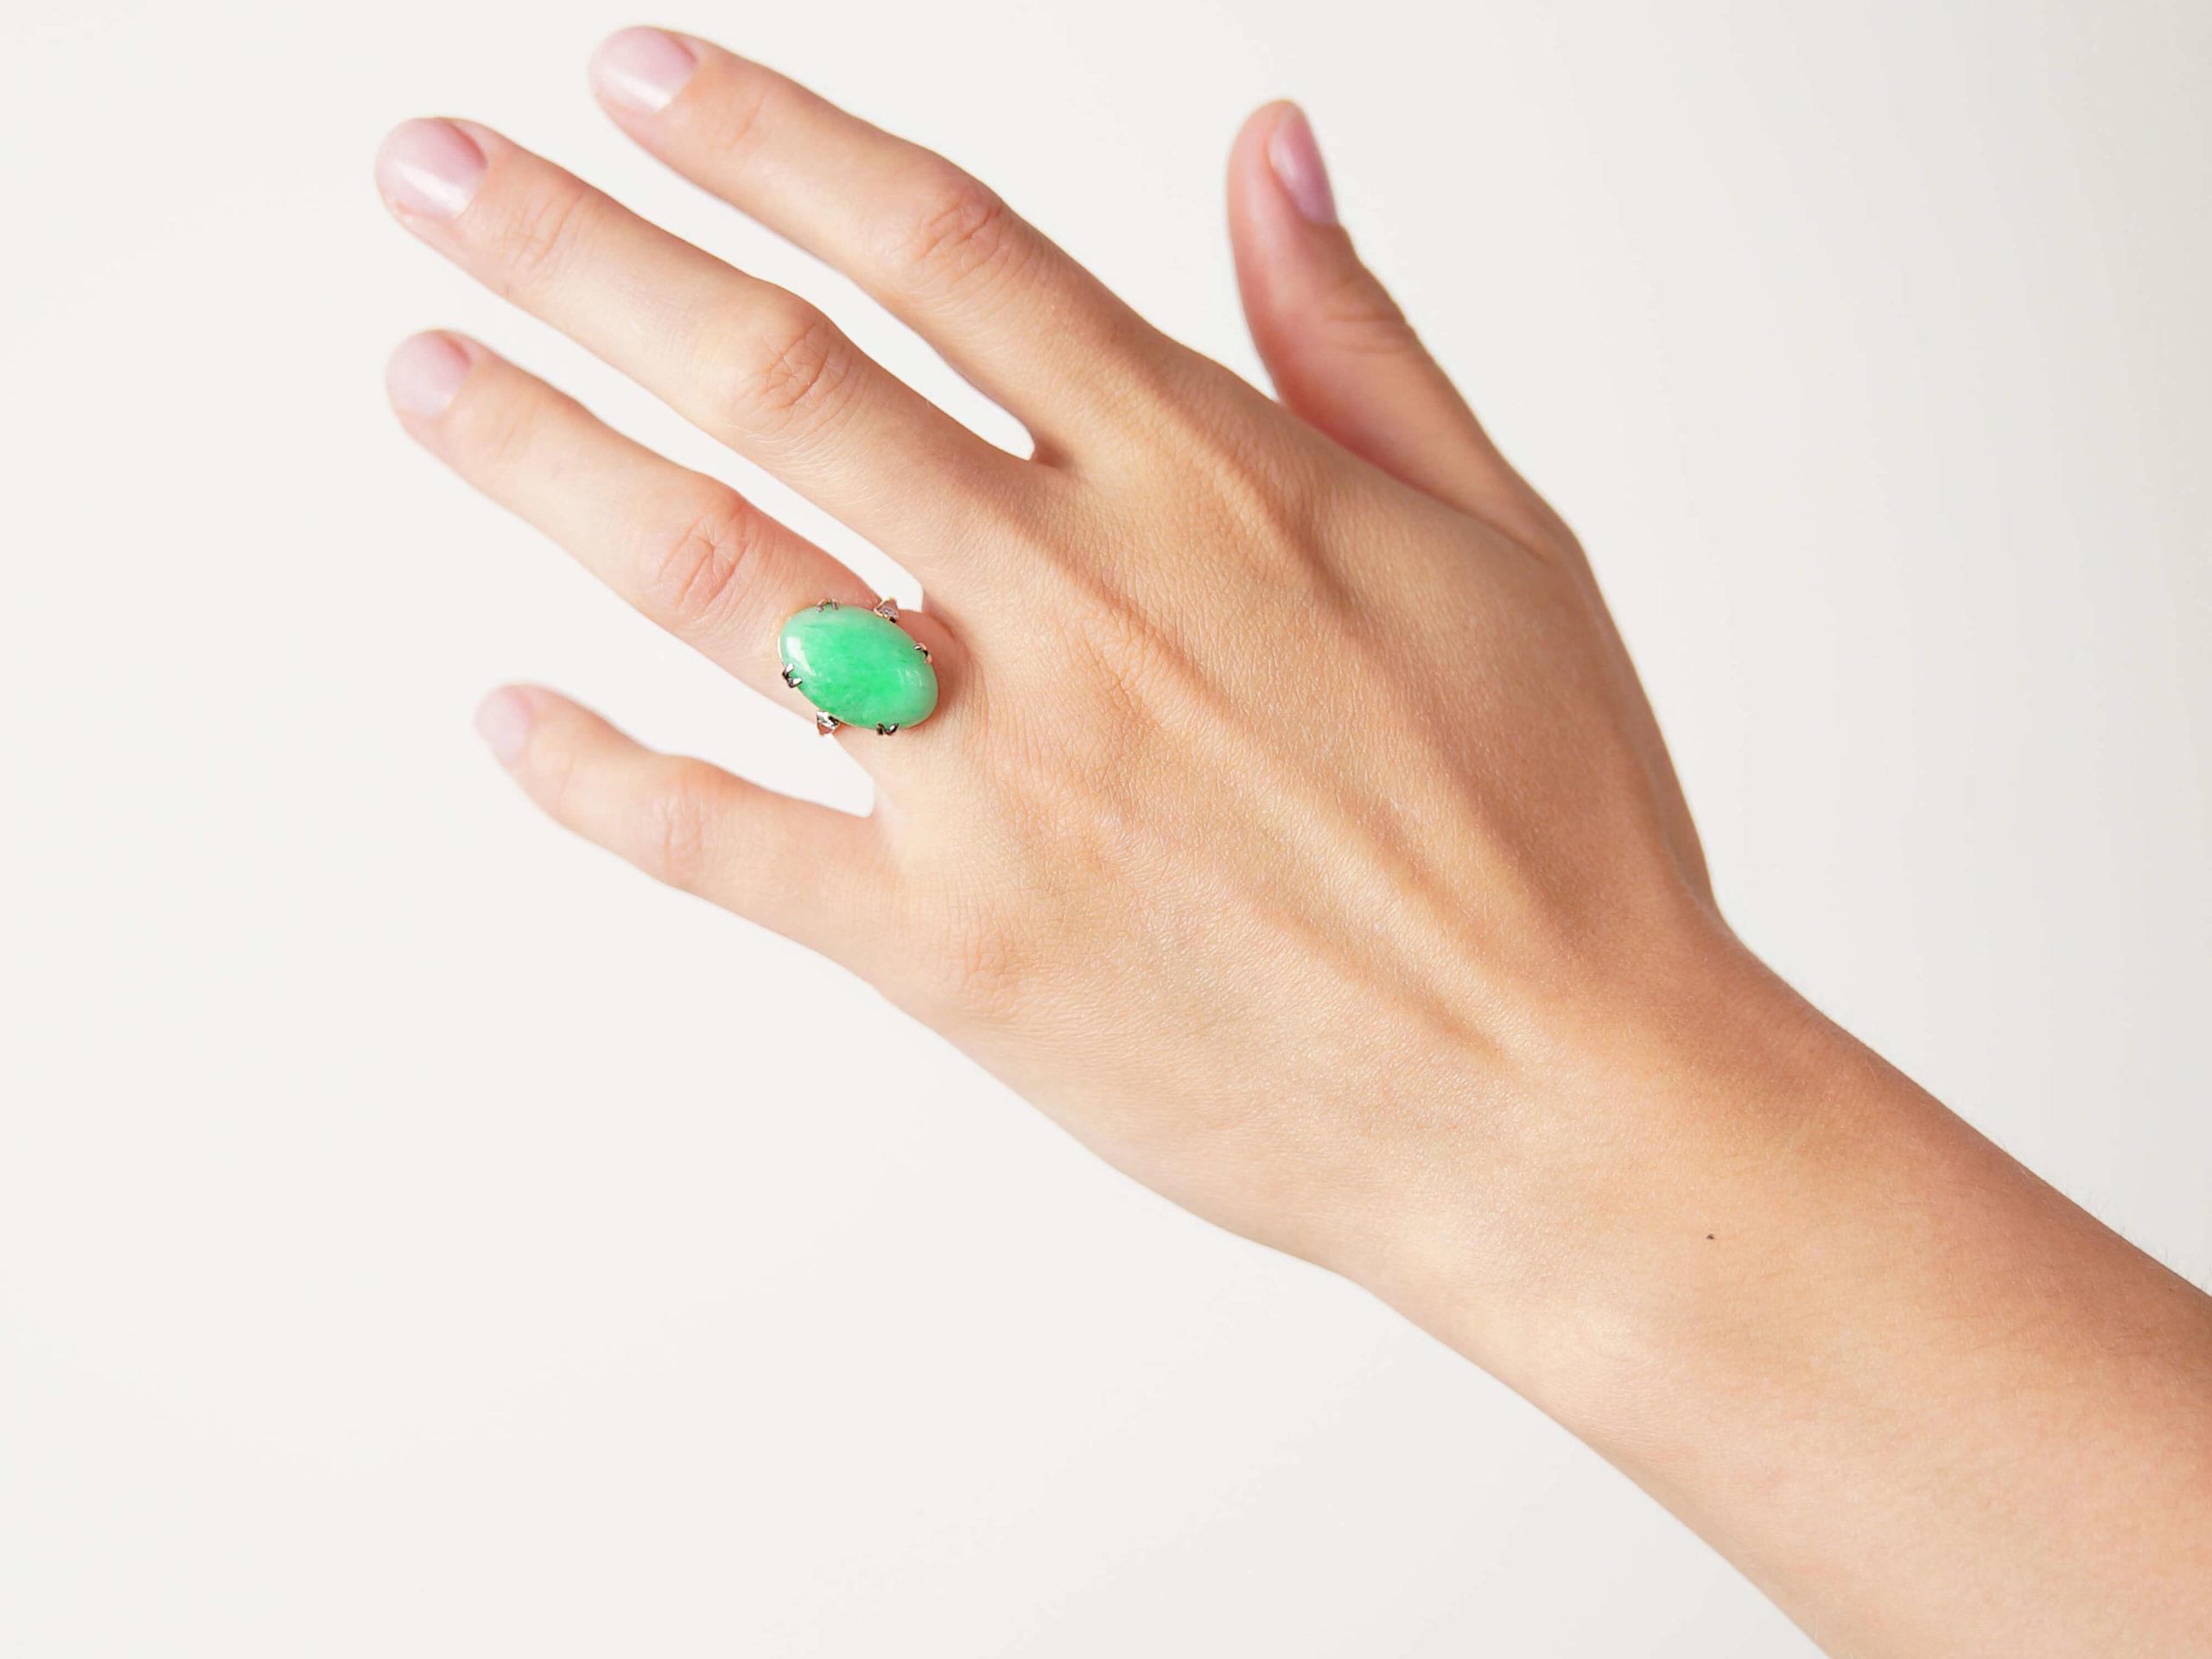 Art Deco 18ct Gold & Platinum Jade Ring with Diamond Set Shoulders